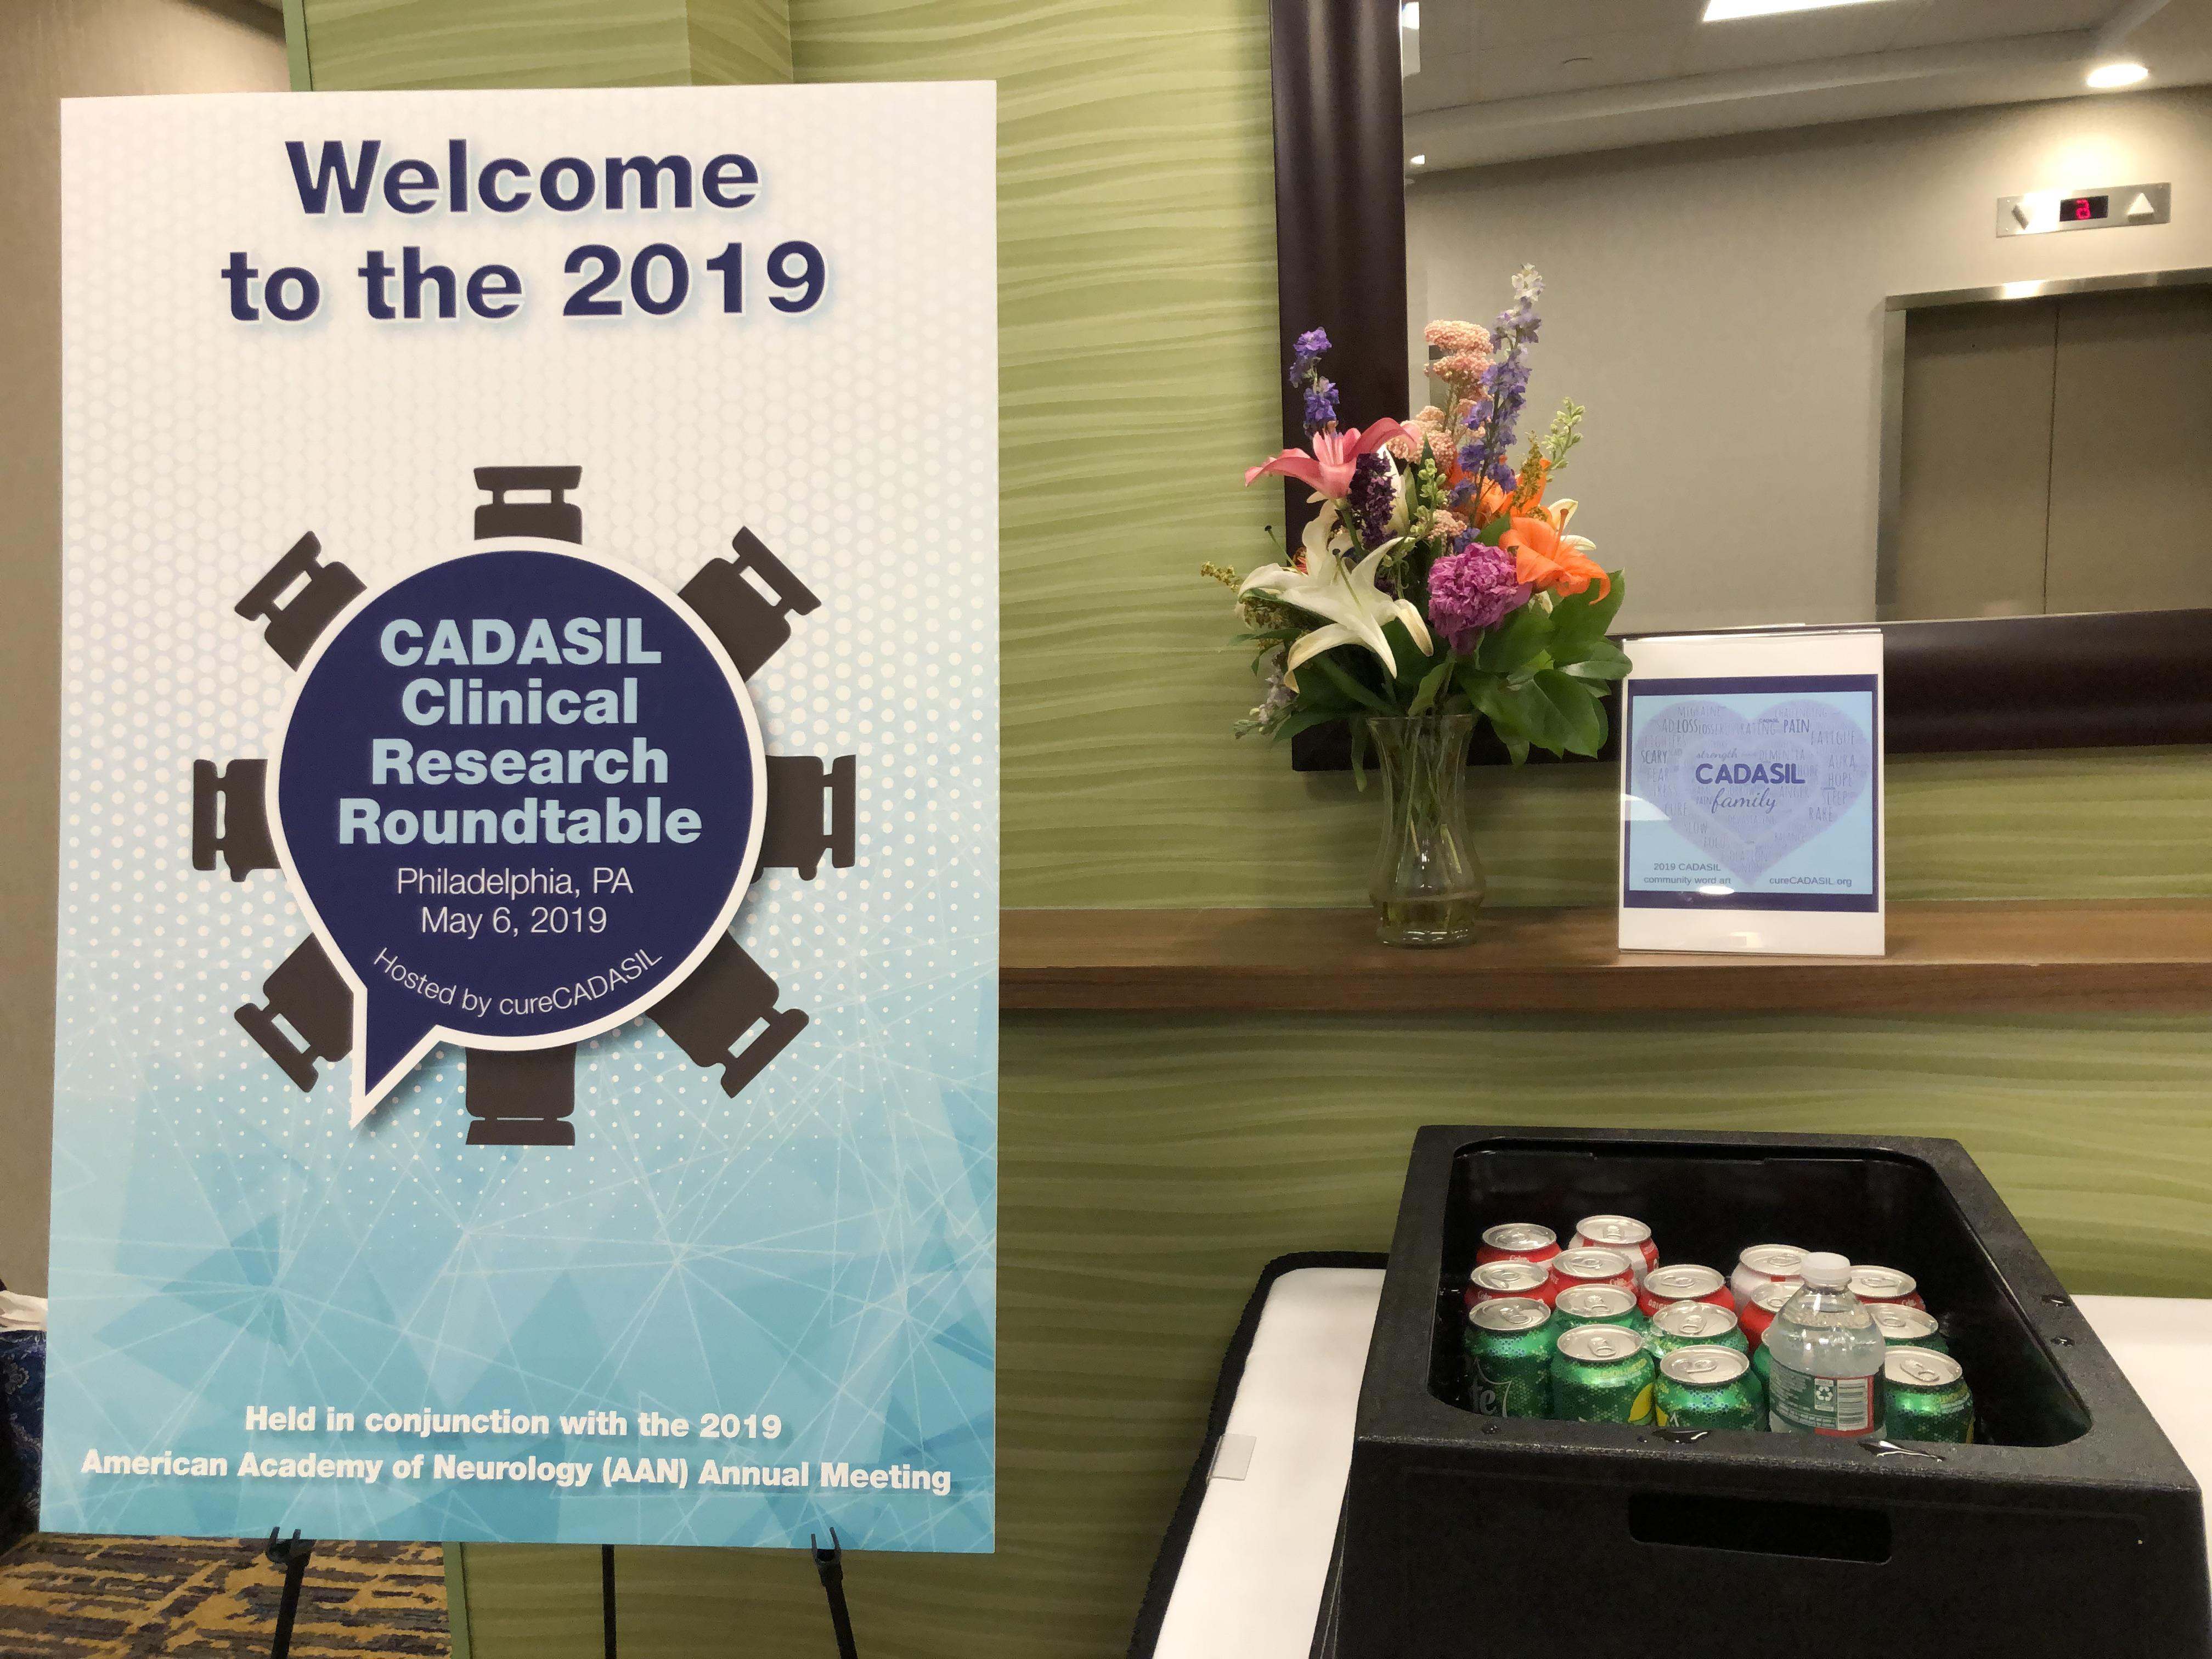 cureCADASIL Hosted the US Roundtable of CADASIL clinical